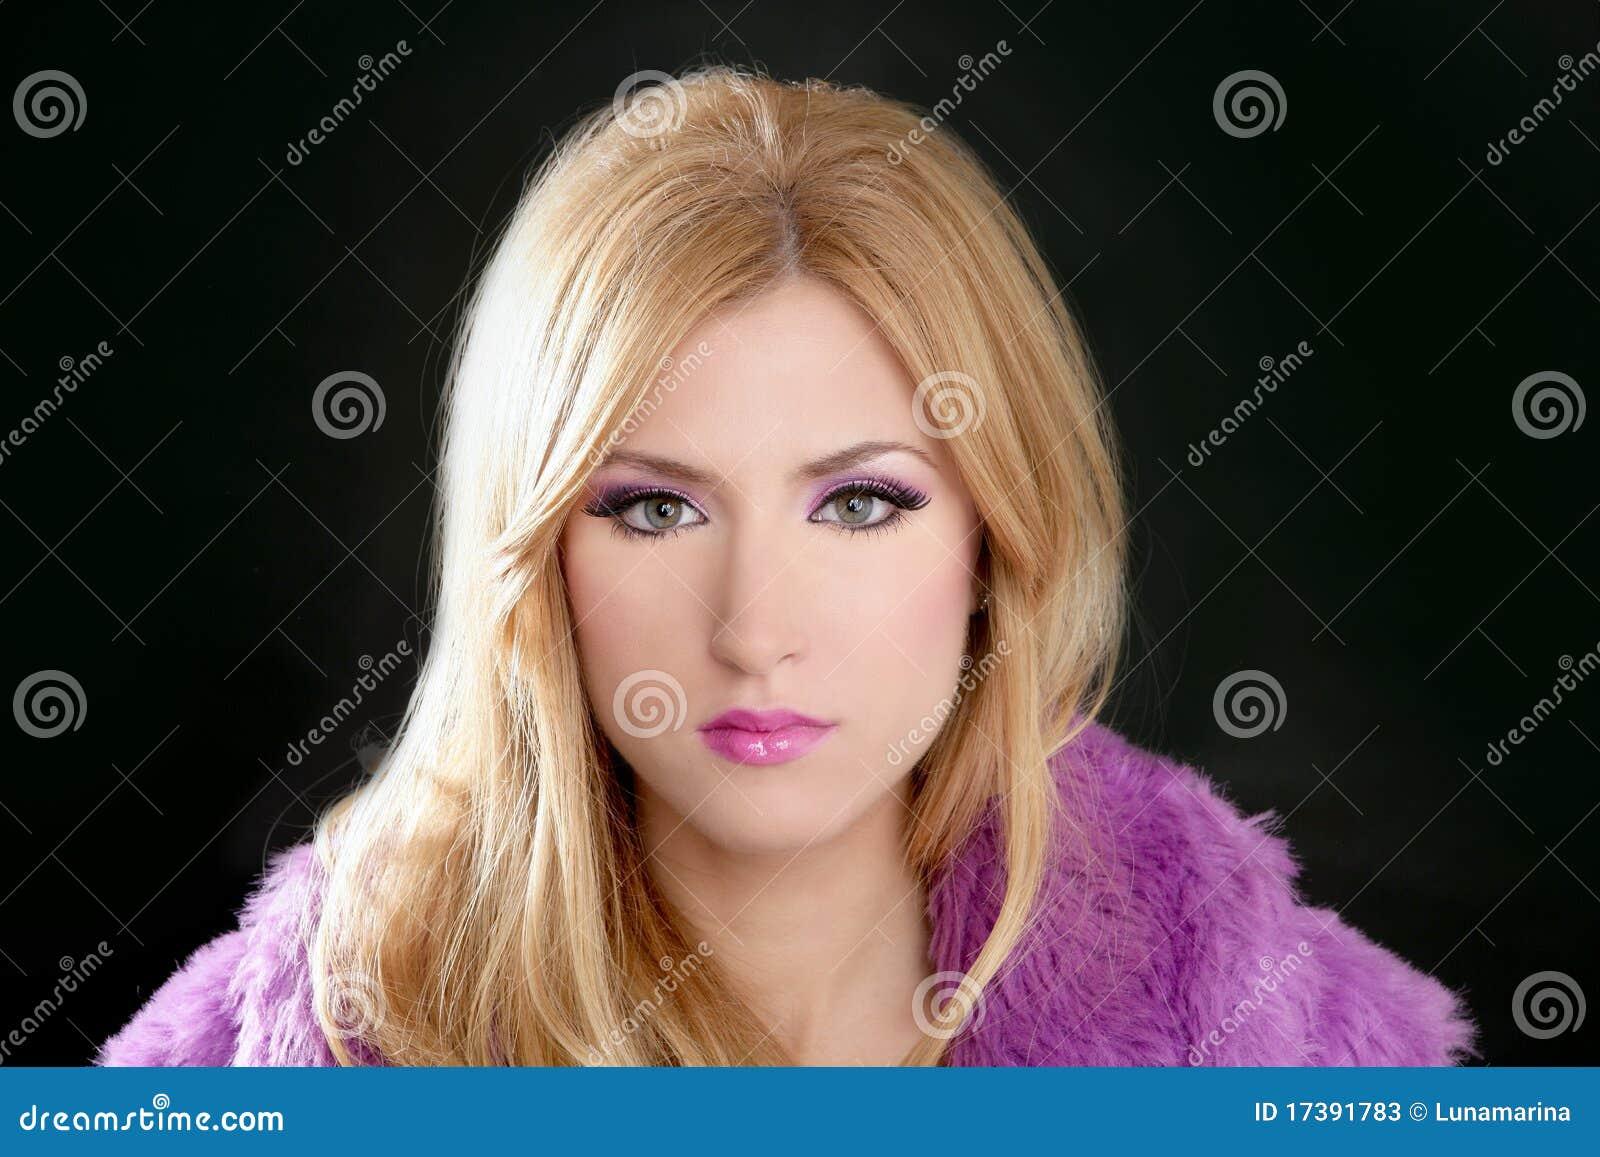 Barbie blonde beautiful woman portrait